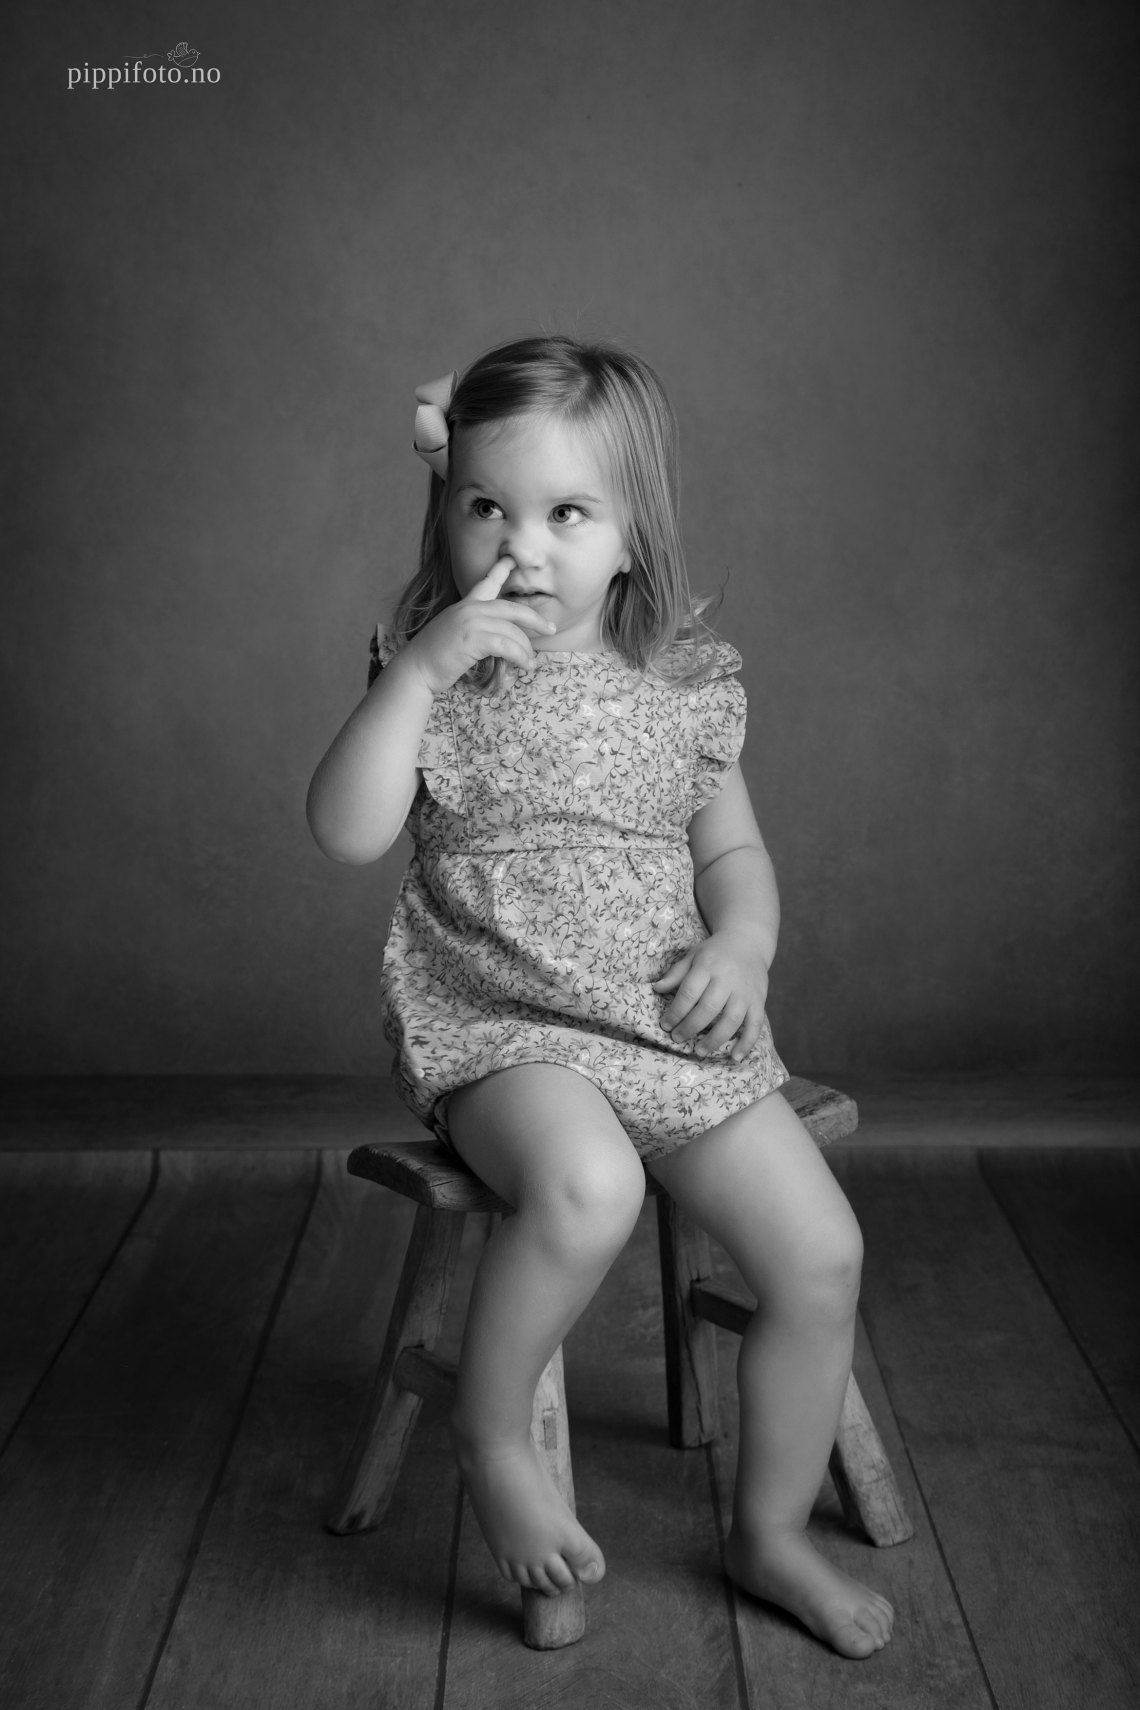 barnebilder-studiofotografering-fotograf-familiefotografering-oslo-Viken